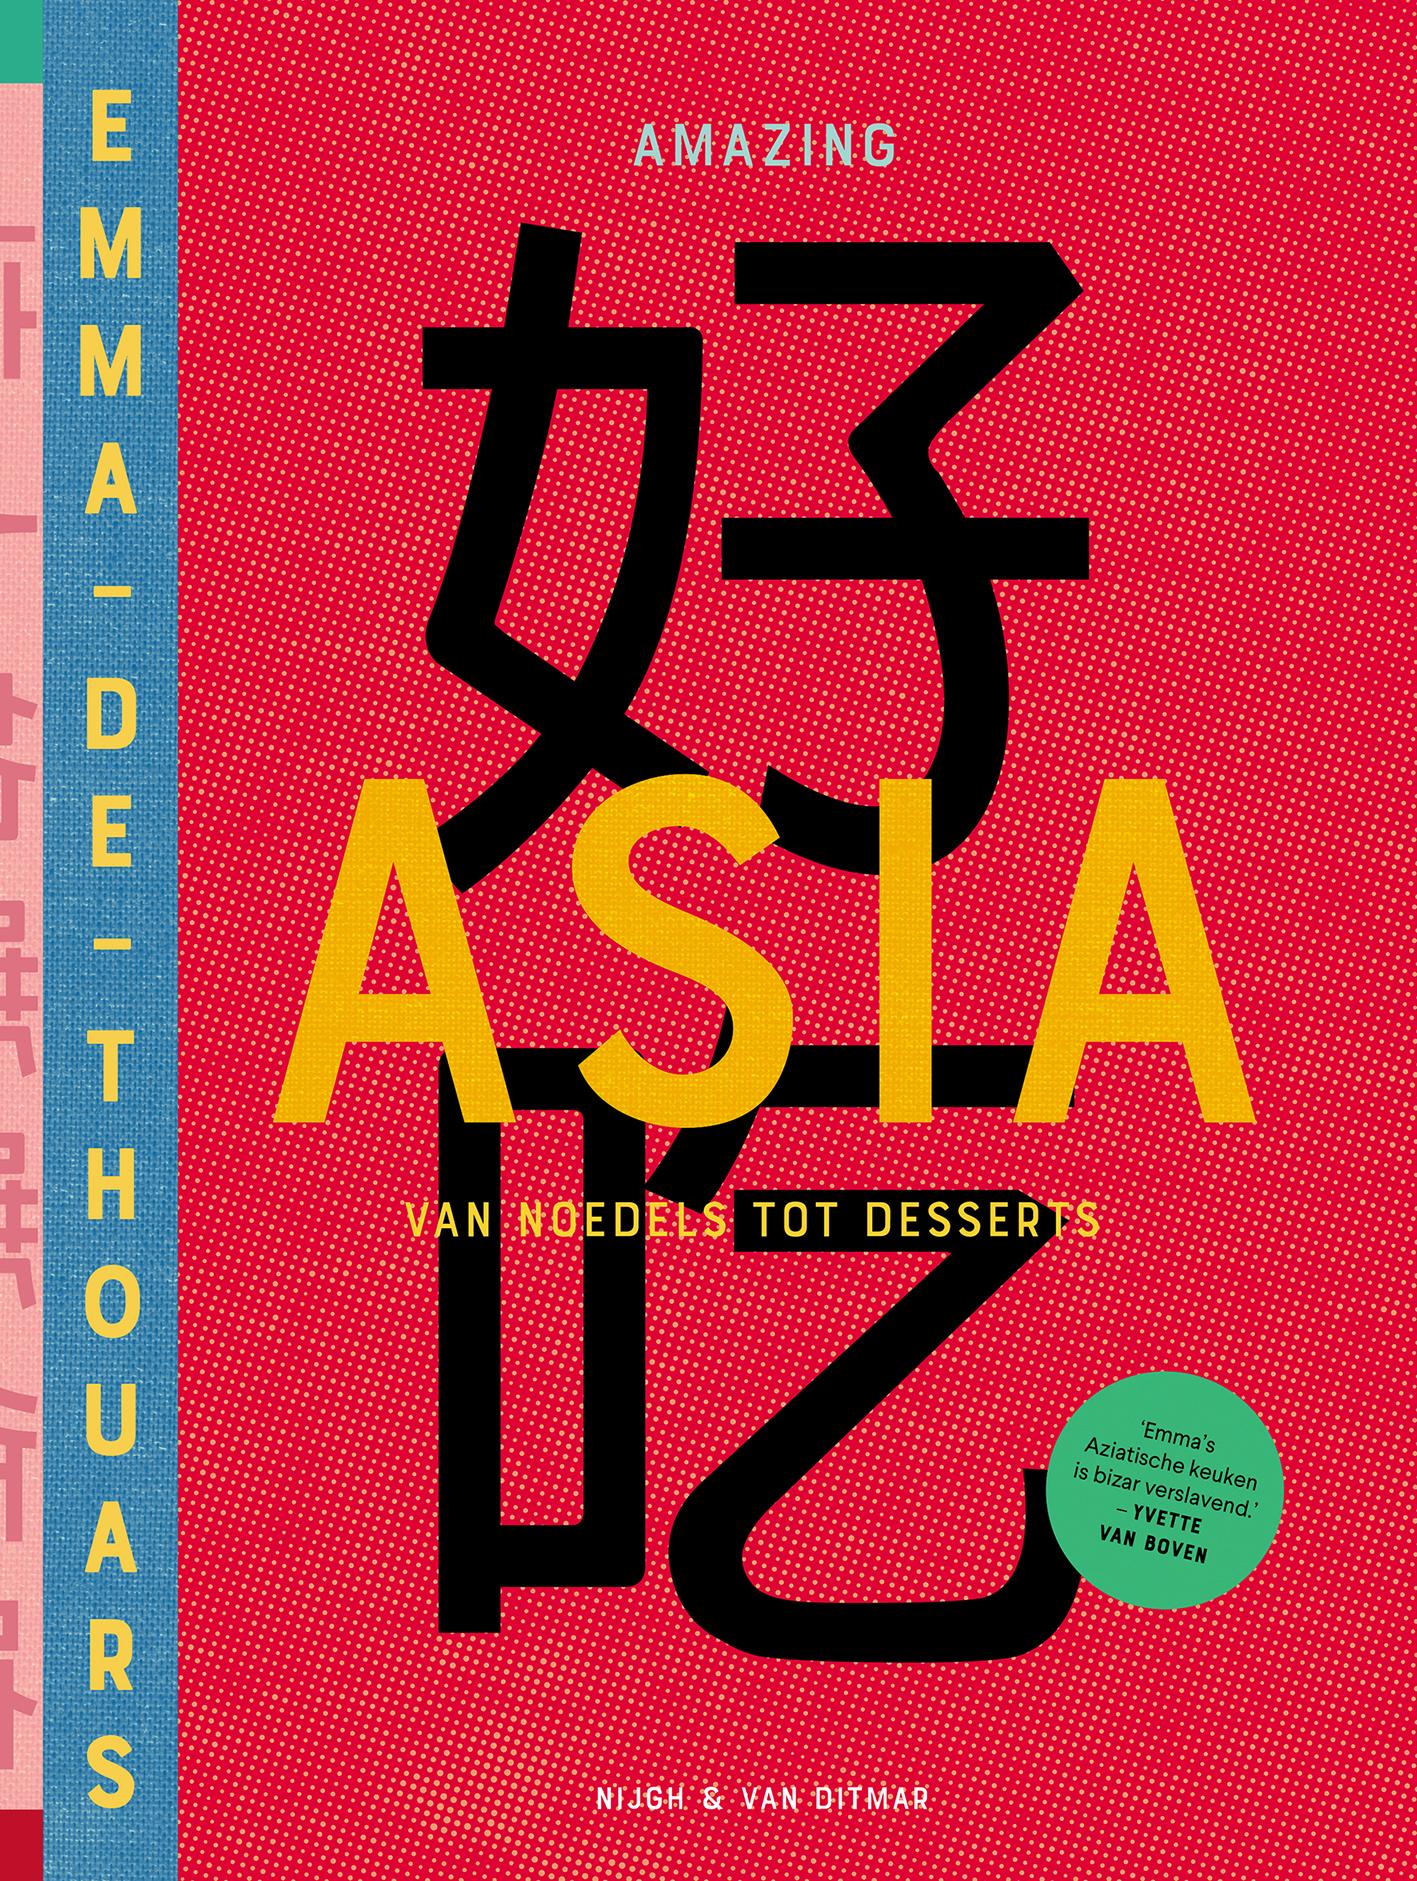 Amazing Asia - boekenflits